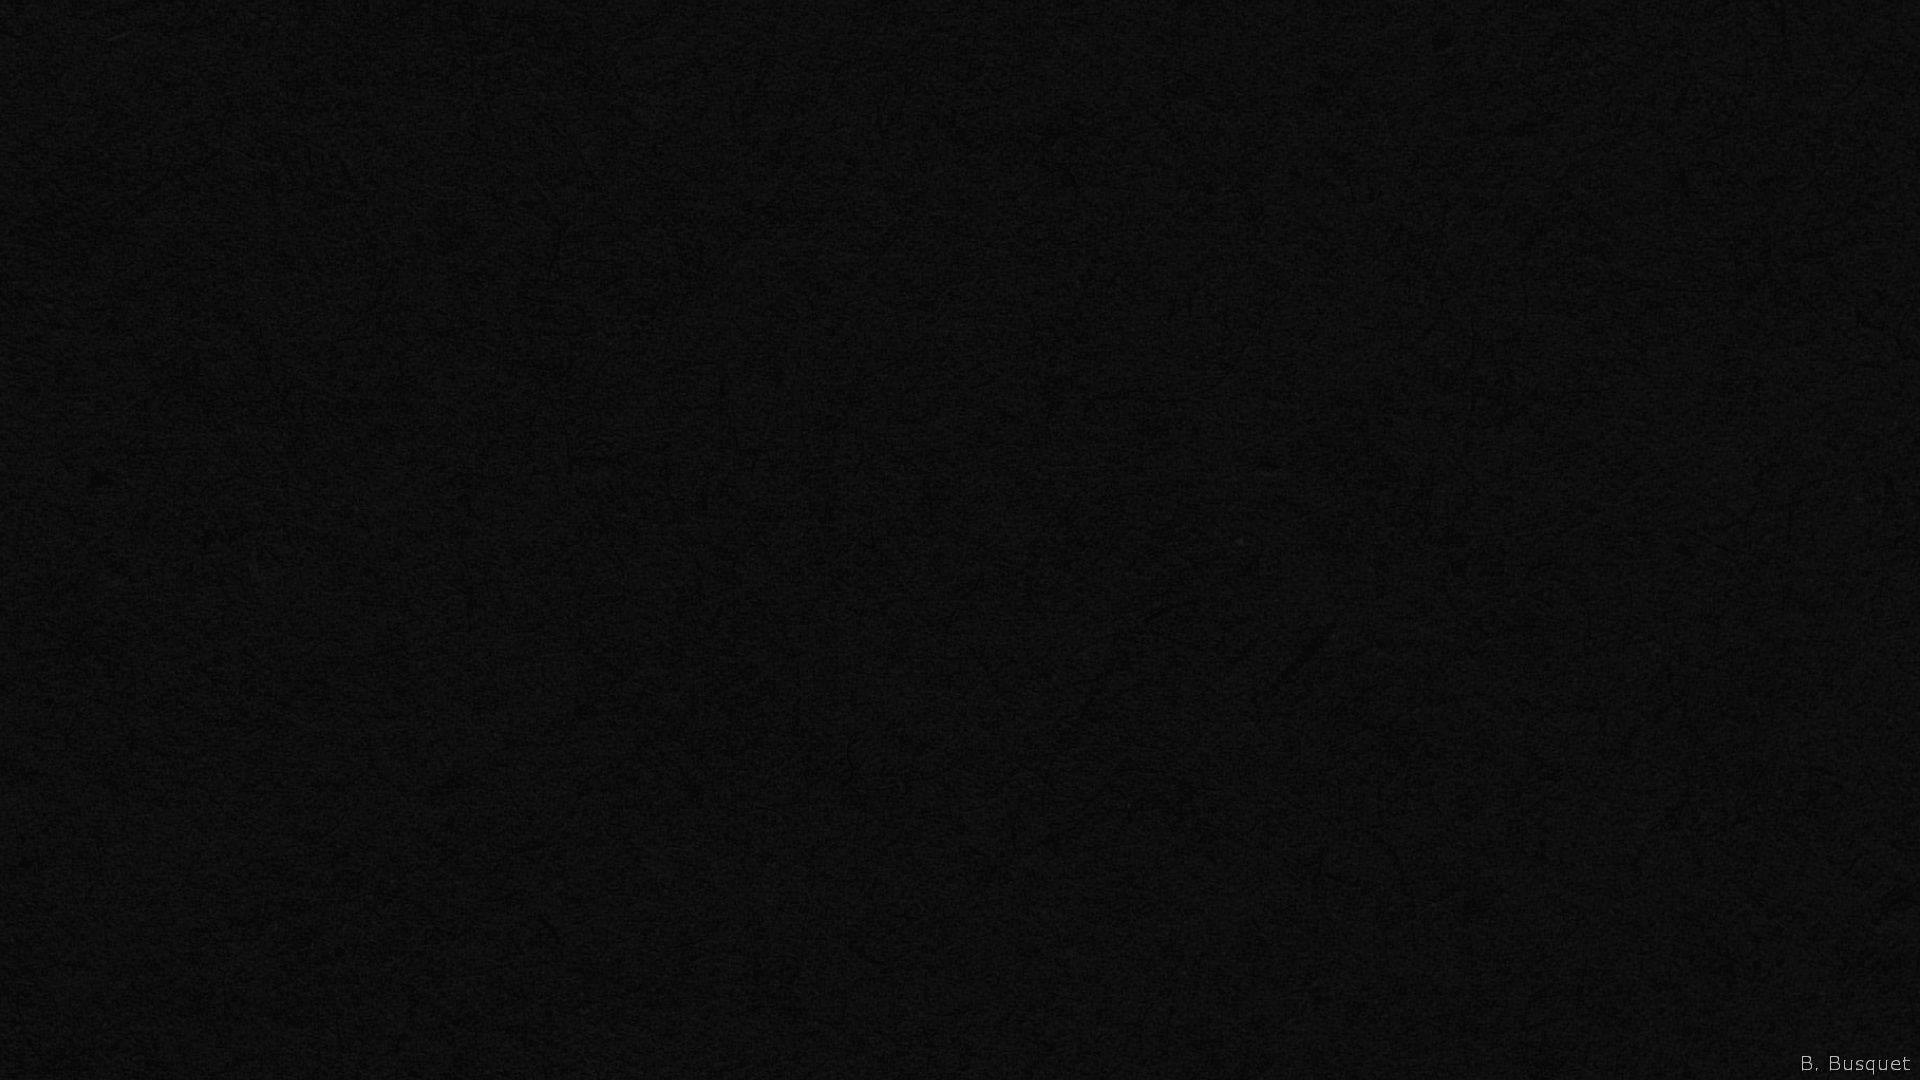 Dark Color Wallpapers Top Free Dark Color Backgrounds Wallpaperaccess